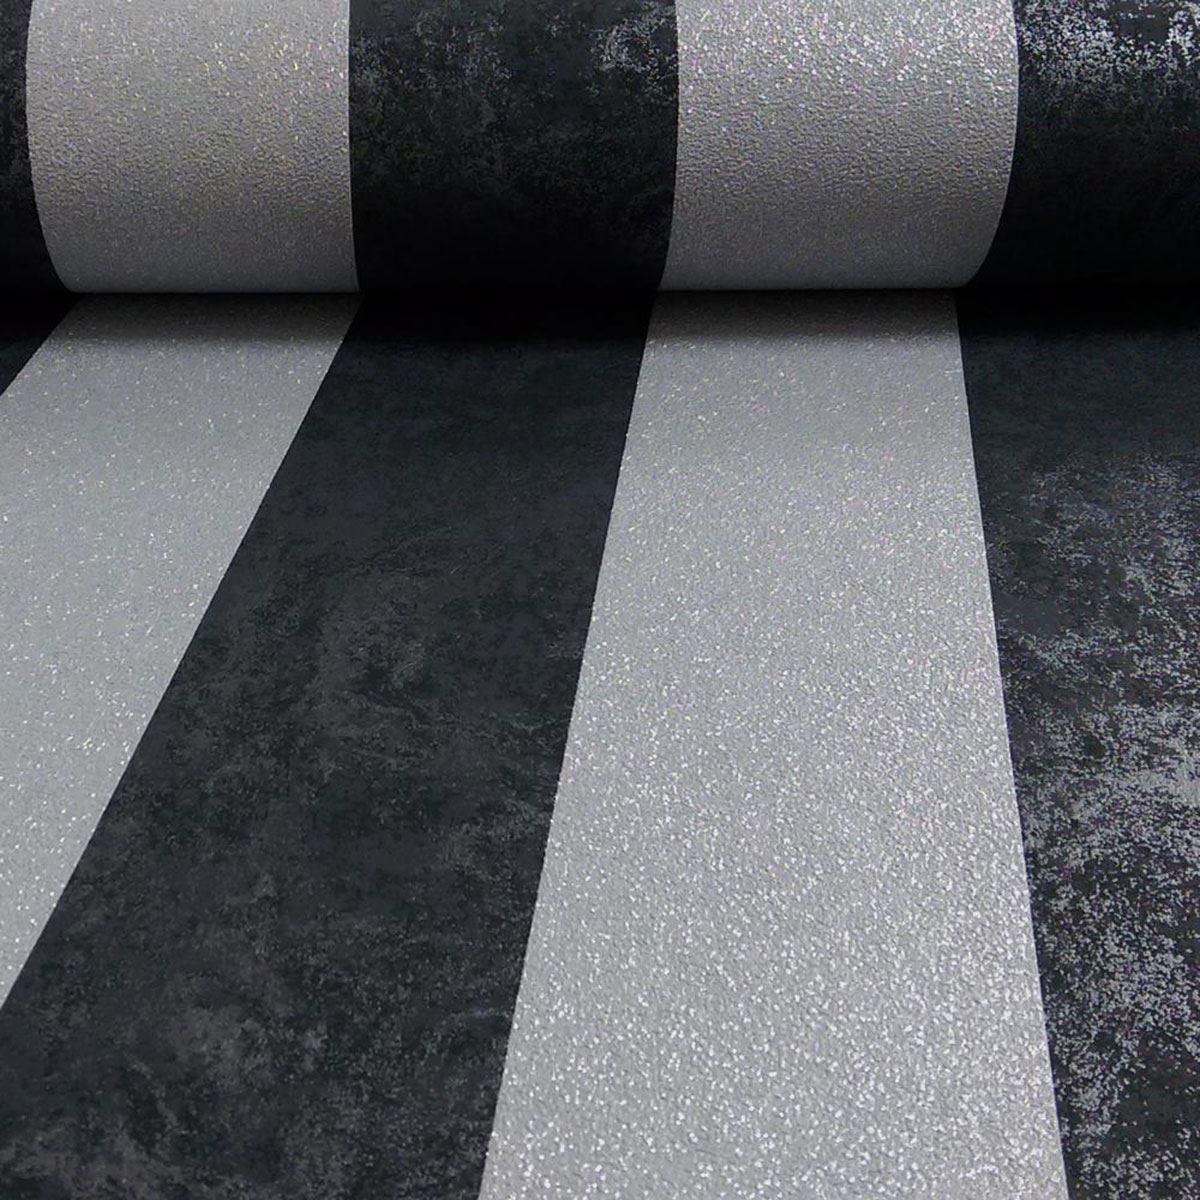 P s carat glitter stripe wallpaper black cream silver gold for Black and silver living room wallpaper